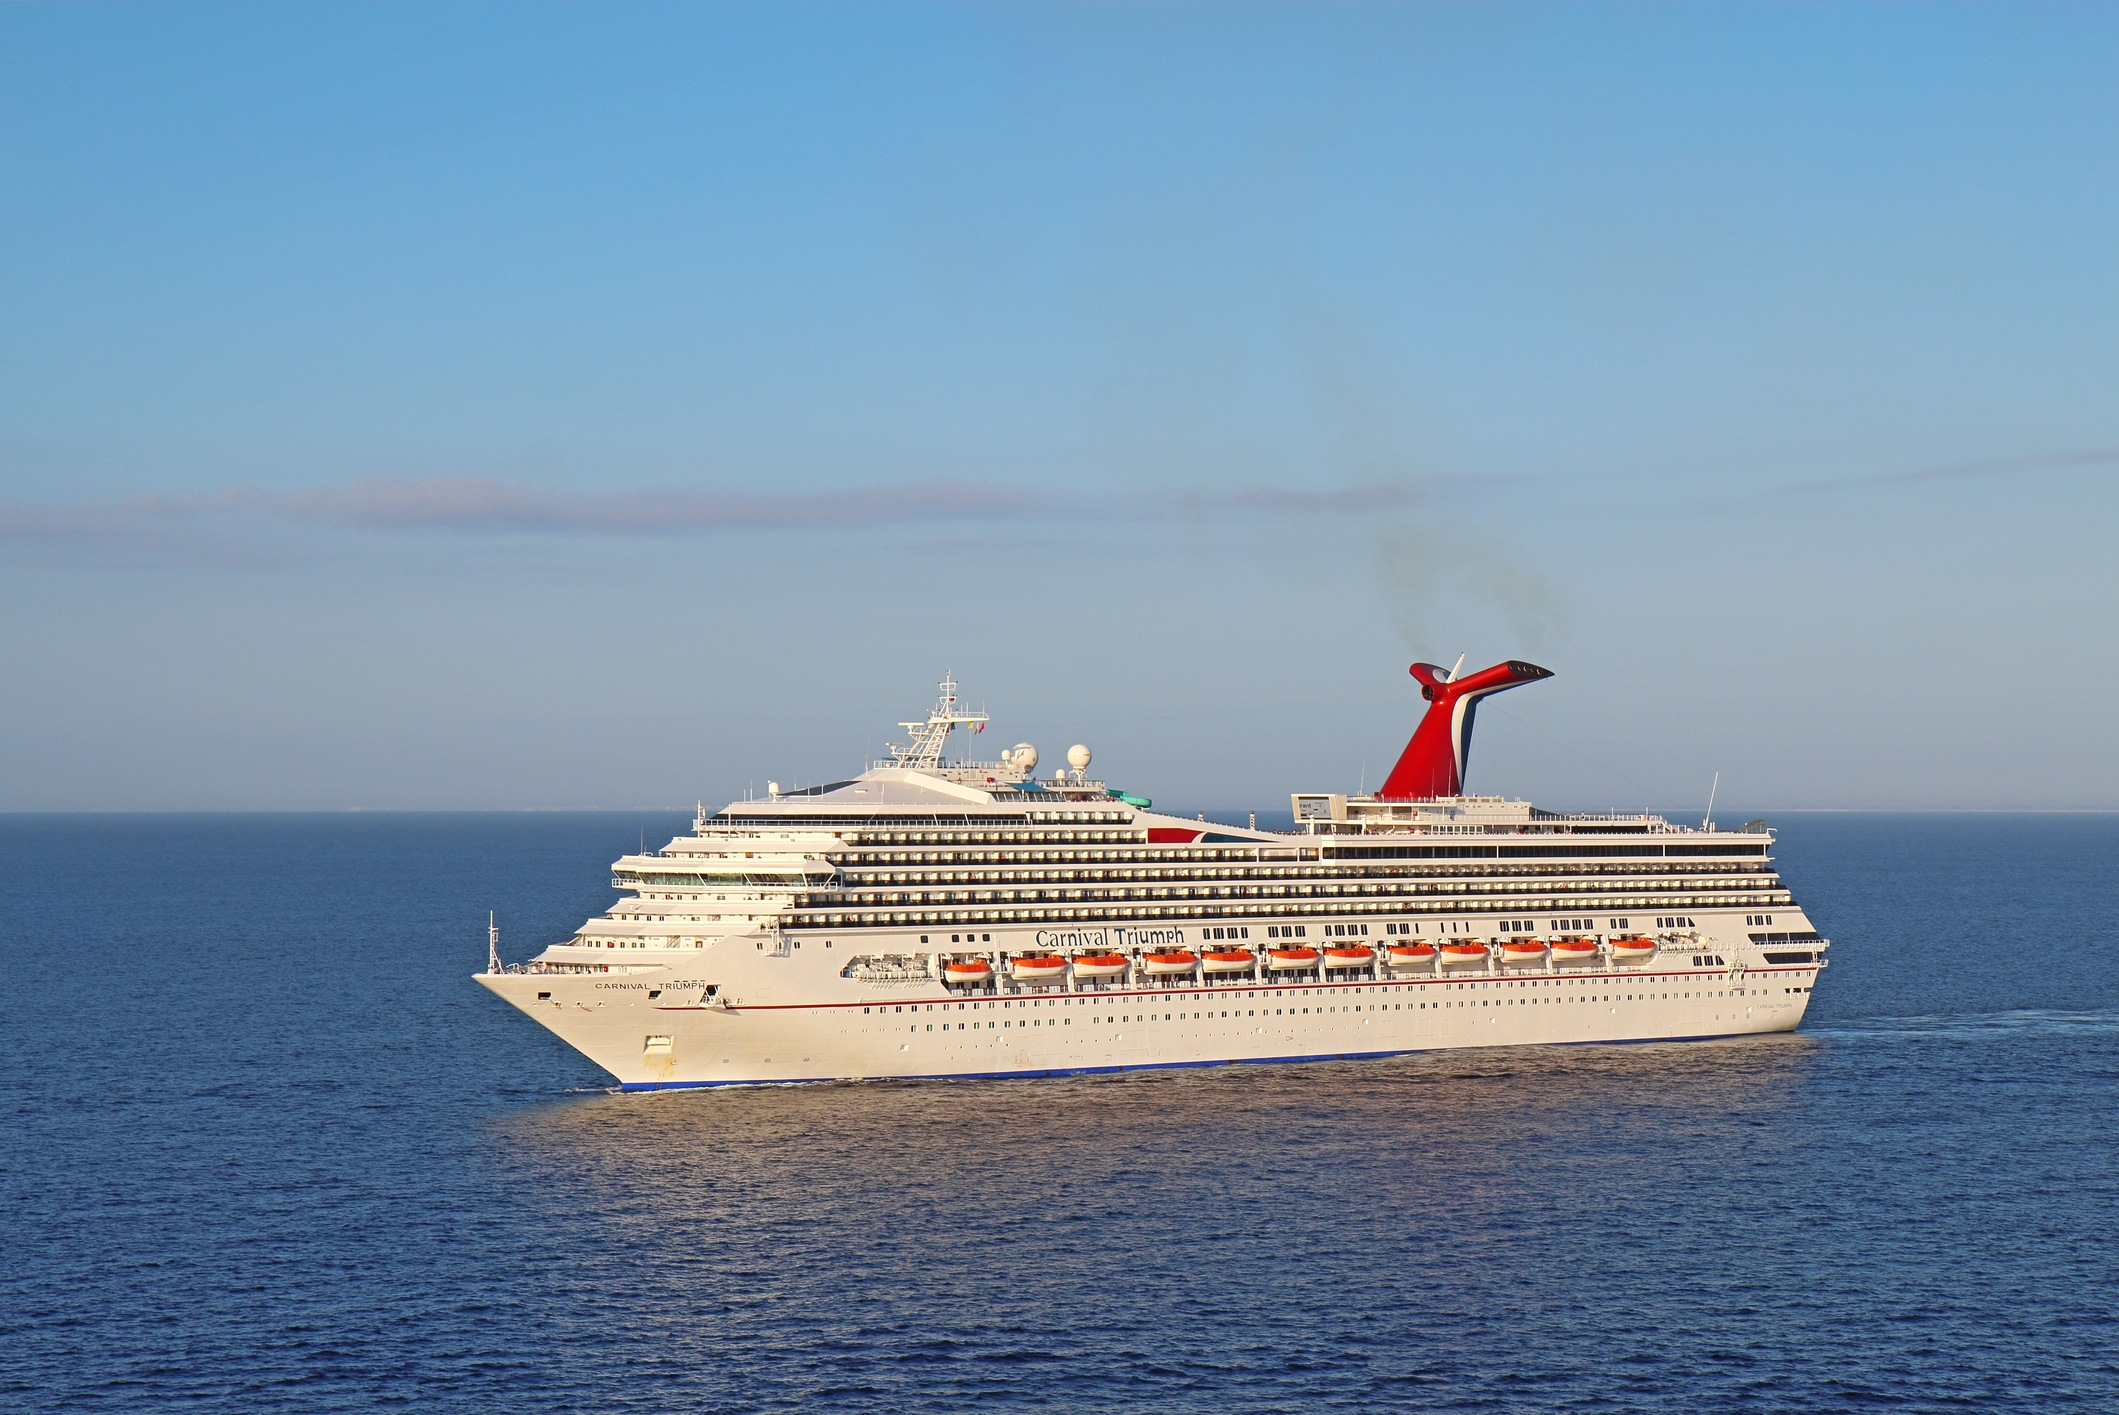 Cruise ship Carnival Triumph on the Caribbean Sea